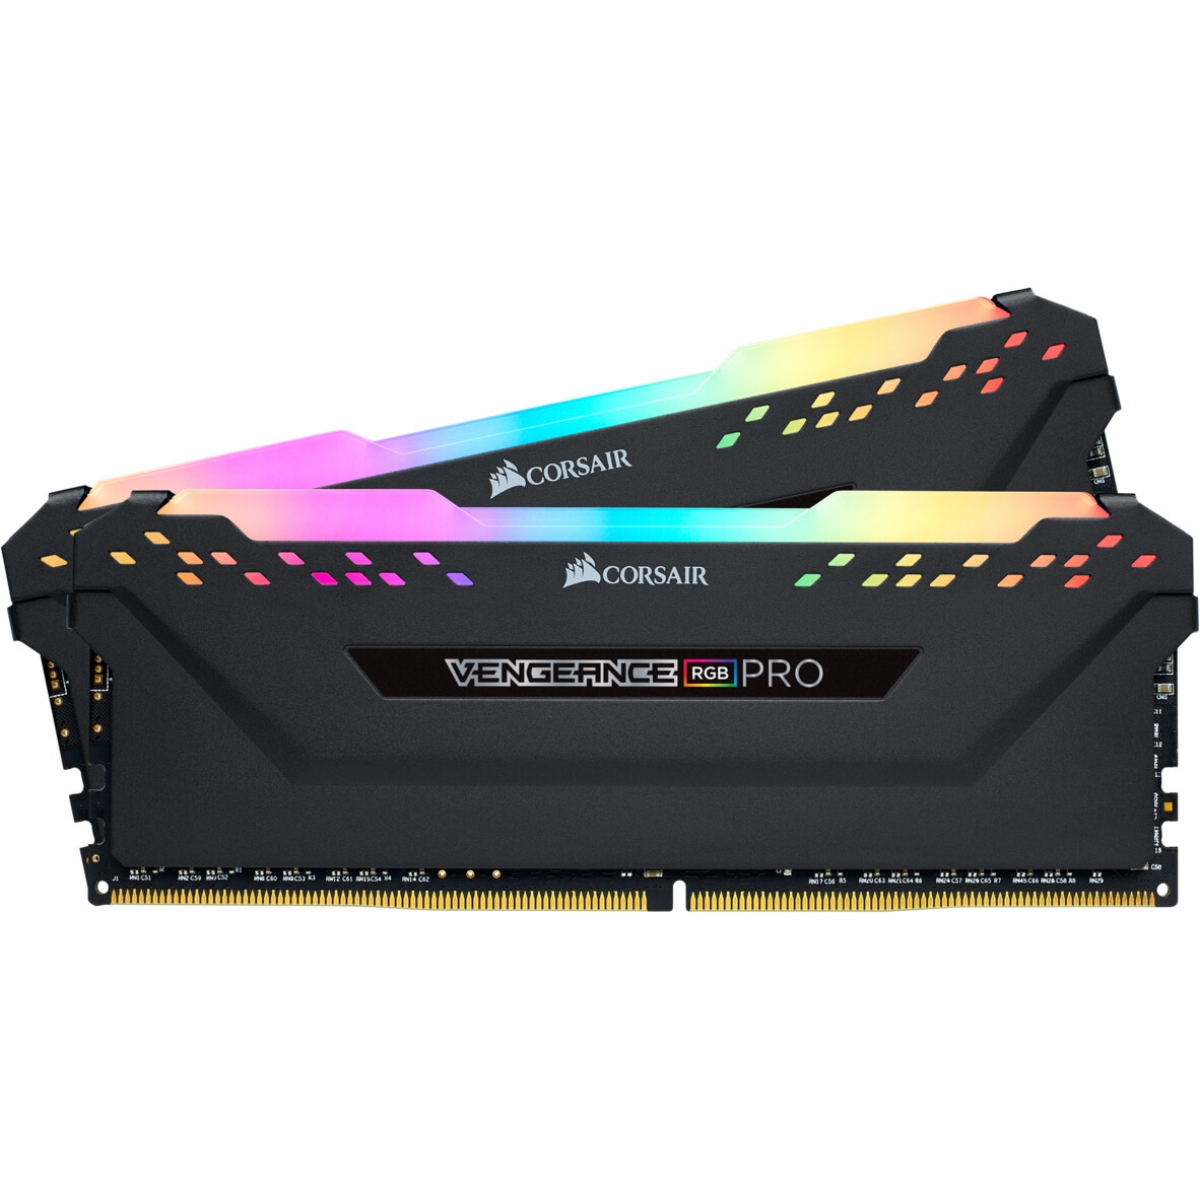 Memória DDR4 Corsair Vengeance RGB Pro, 16GB (2x8GB) 3200MHz, CMW16GX4M2C3200C16